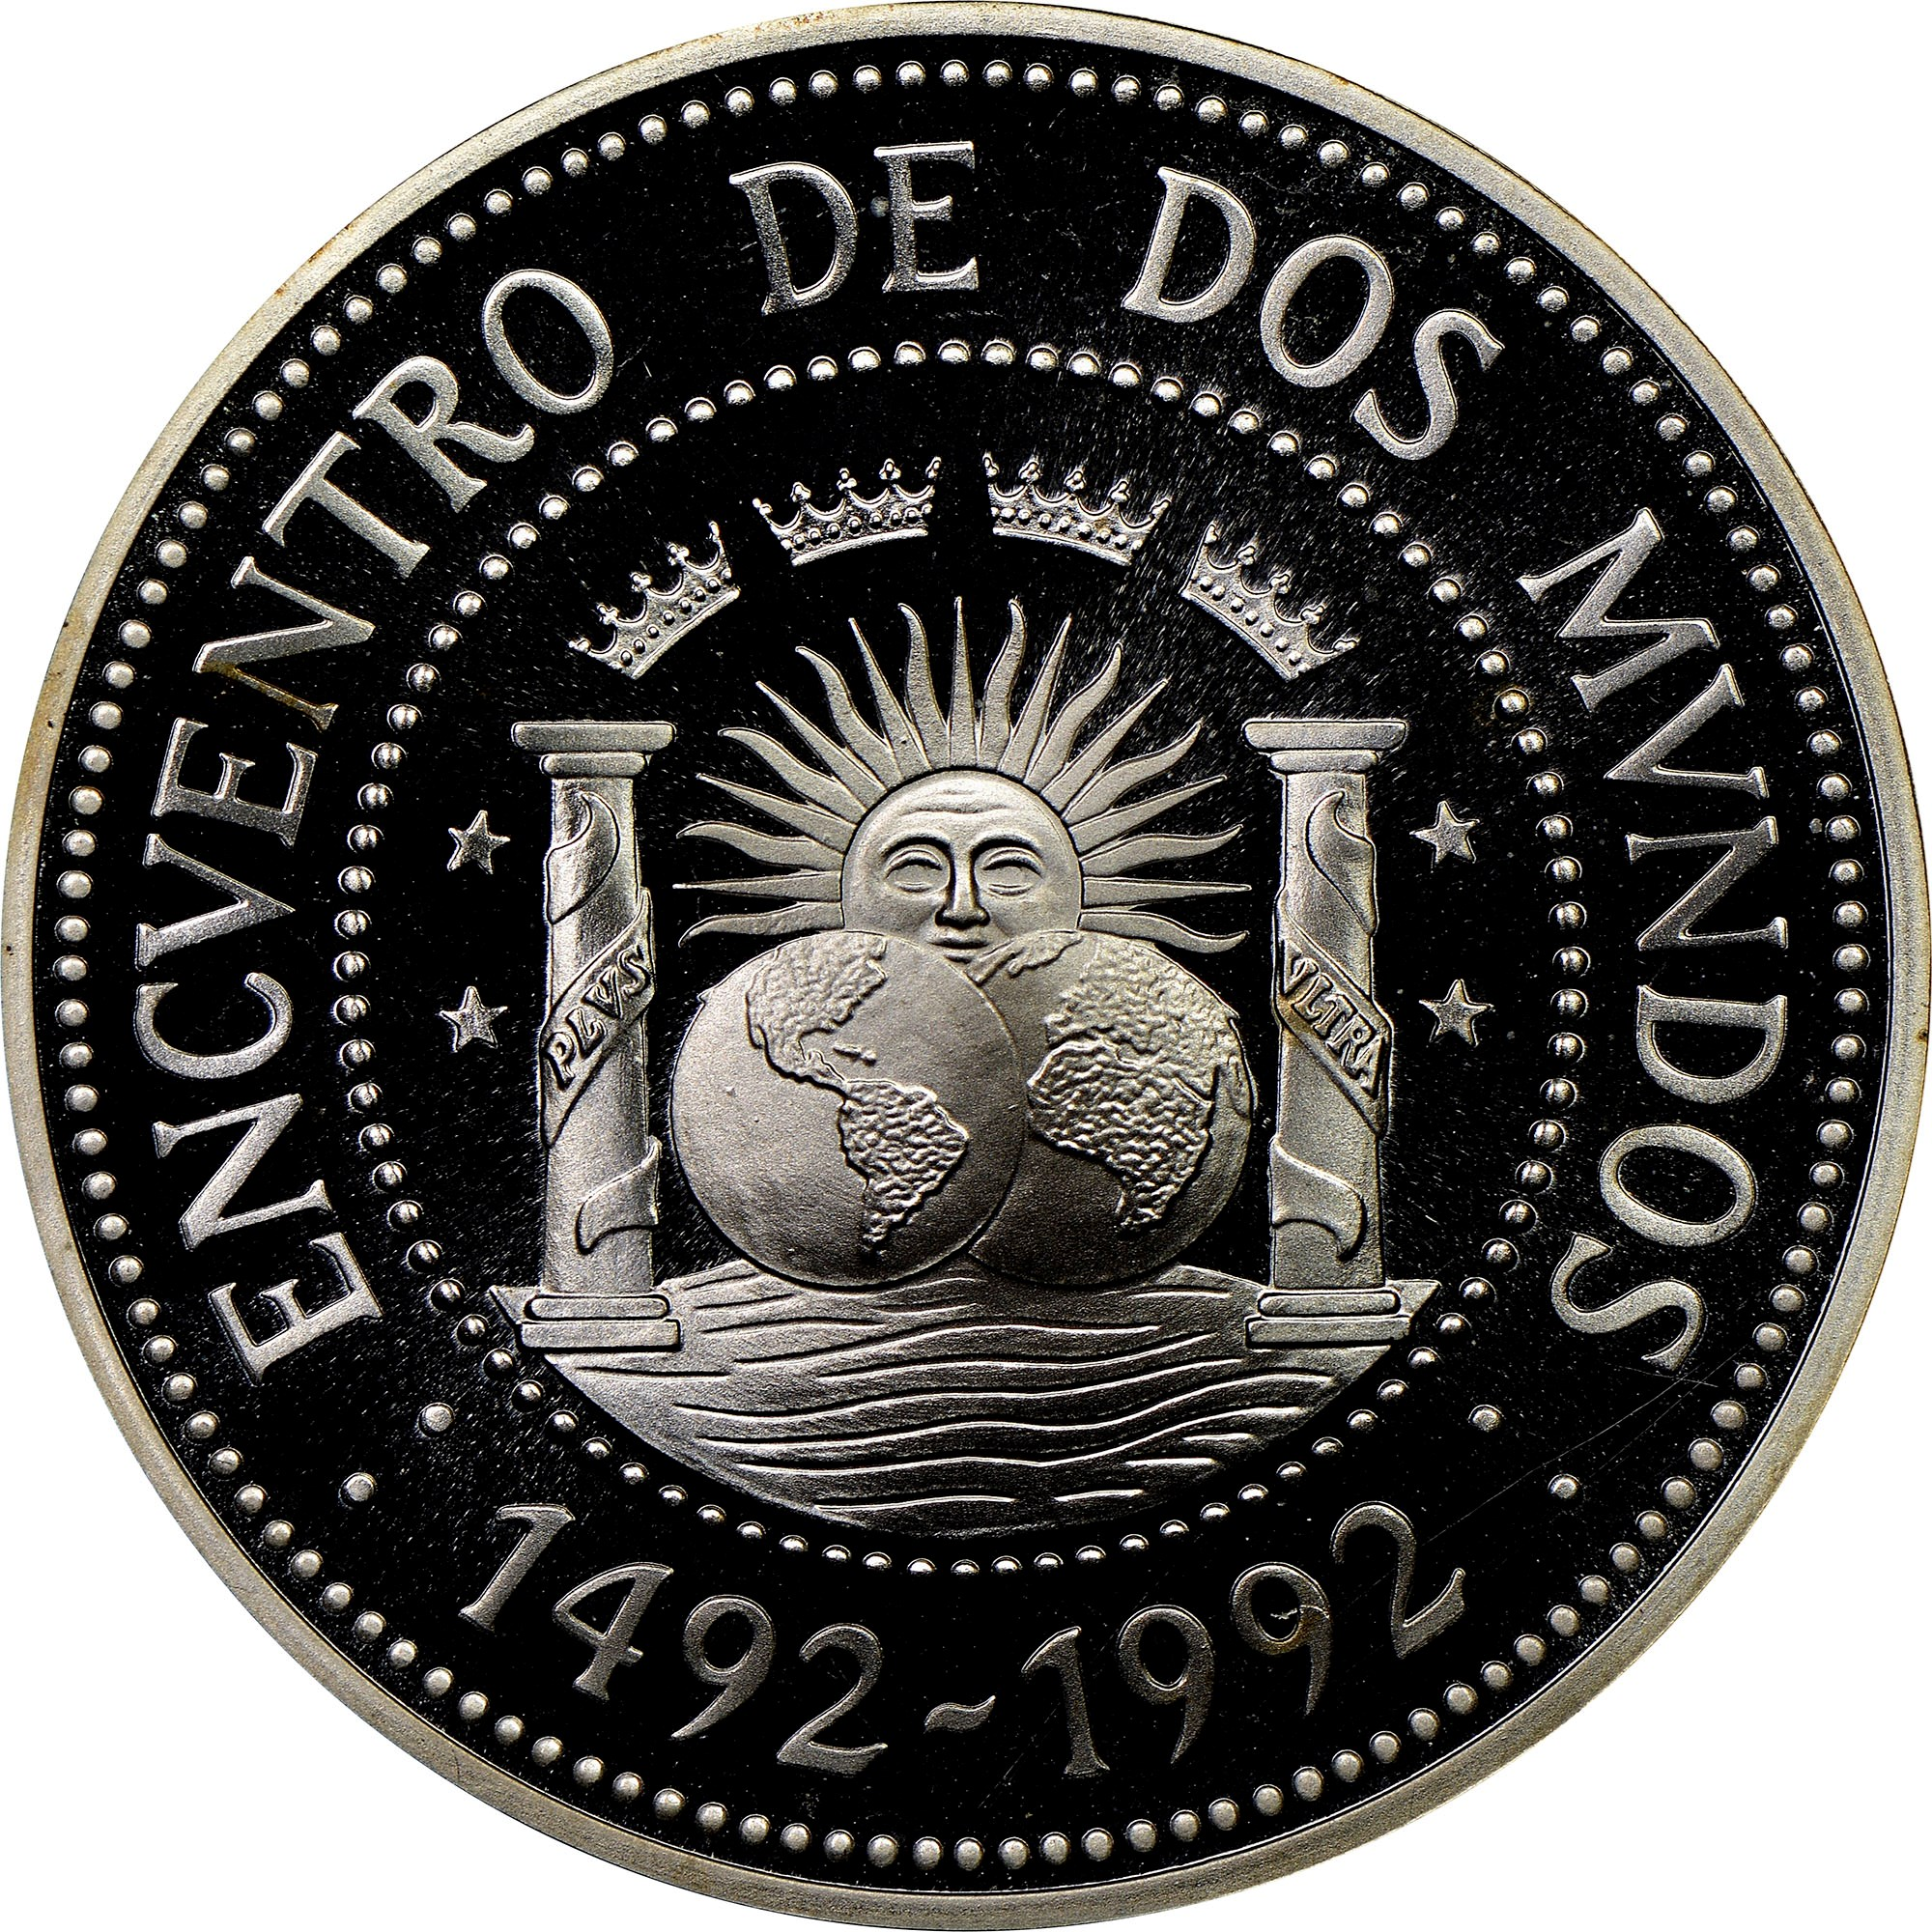 Argentina 1000 Australes reverse